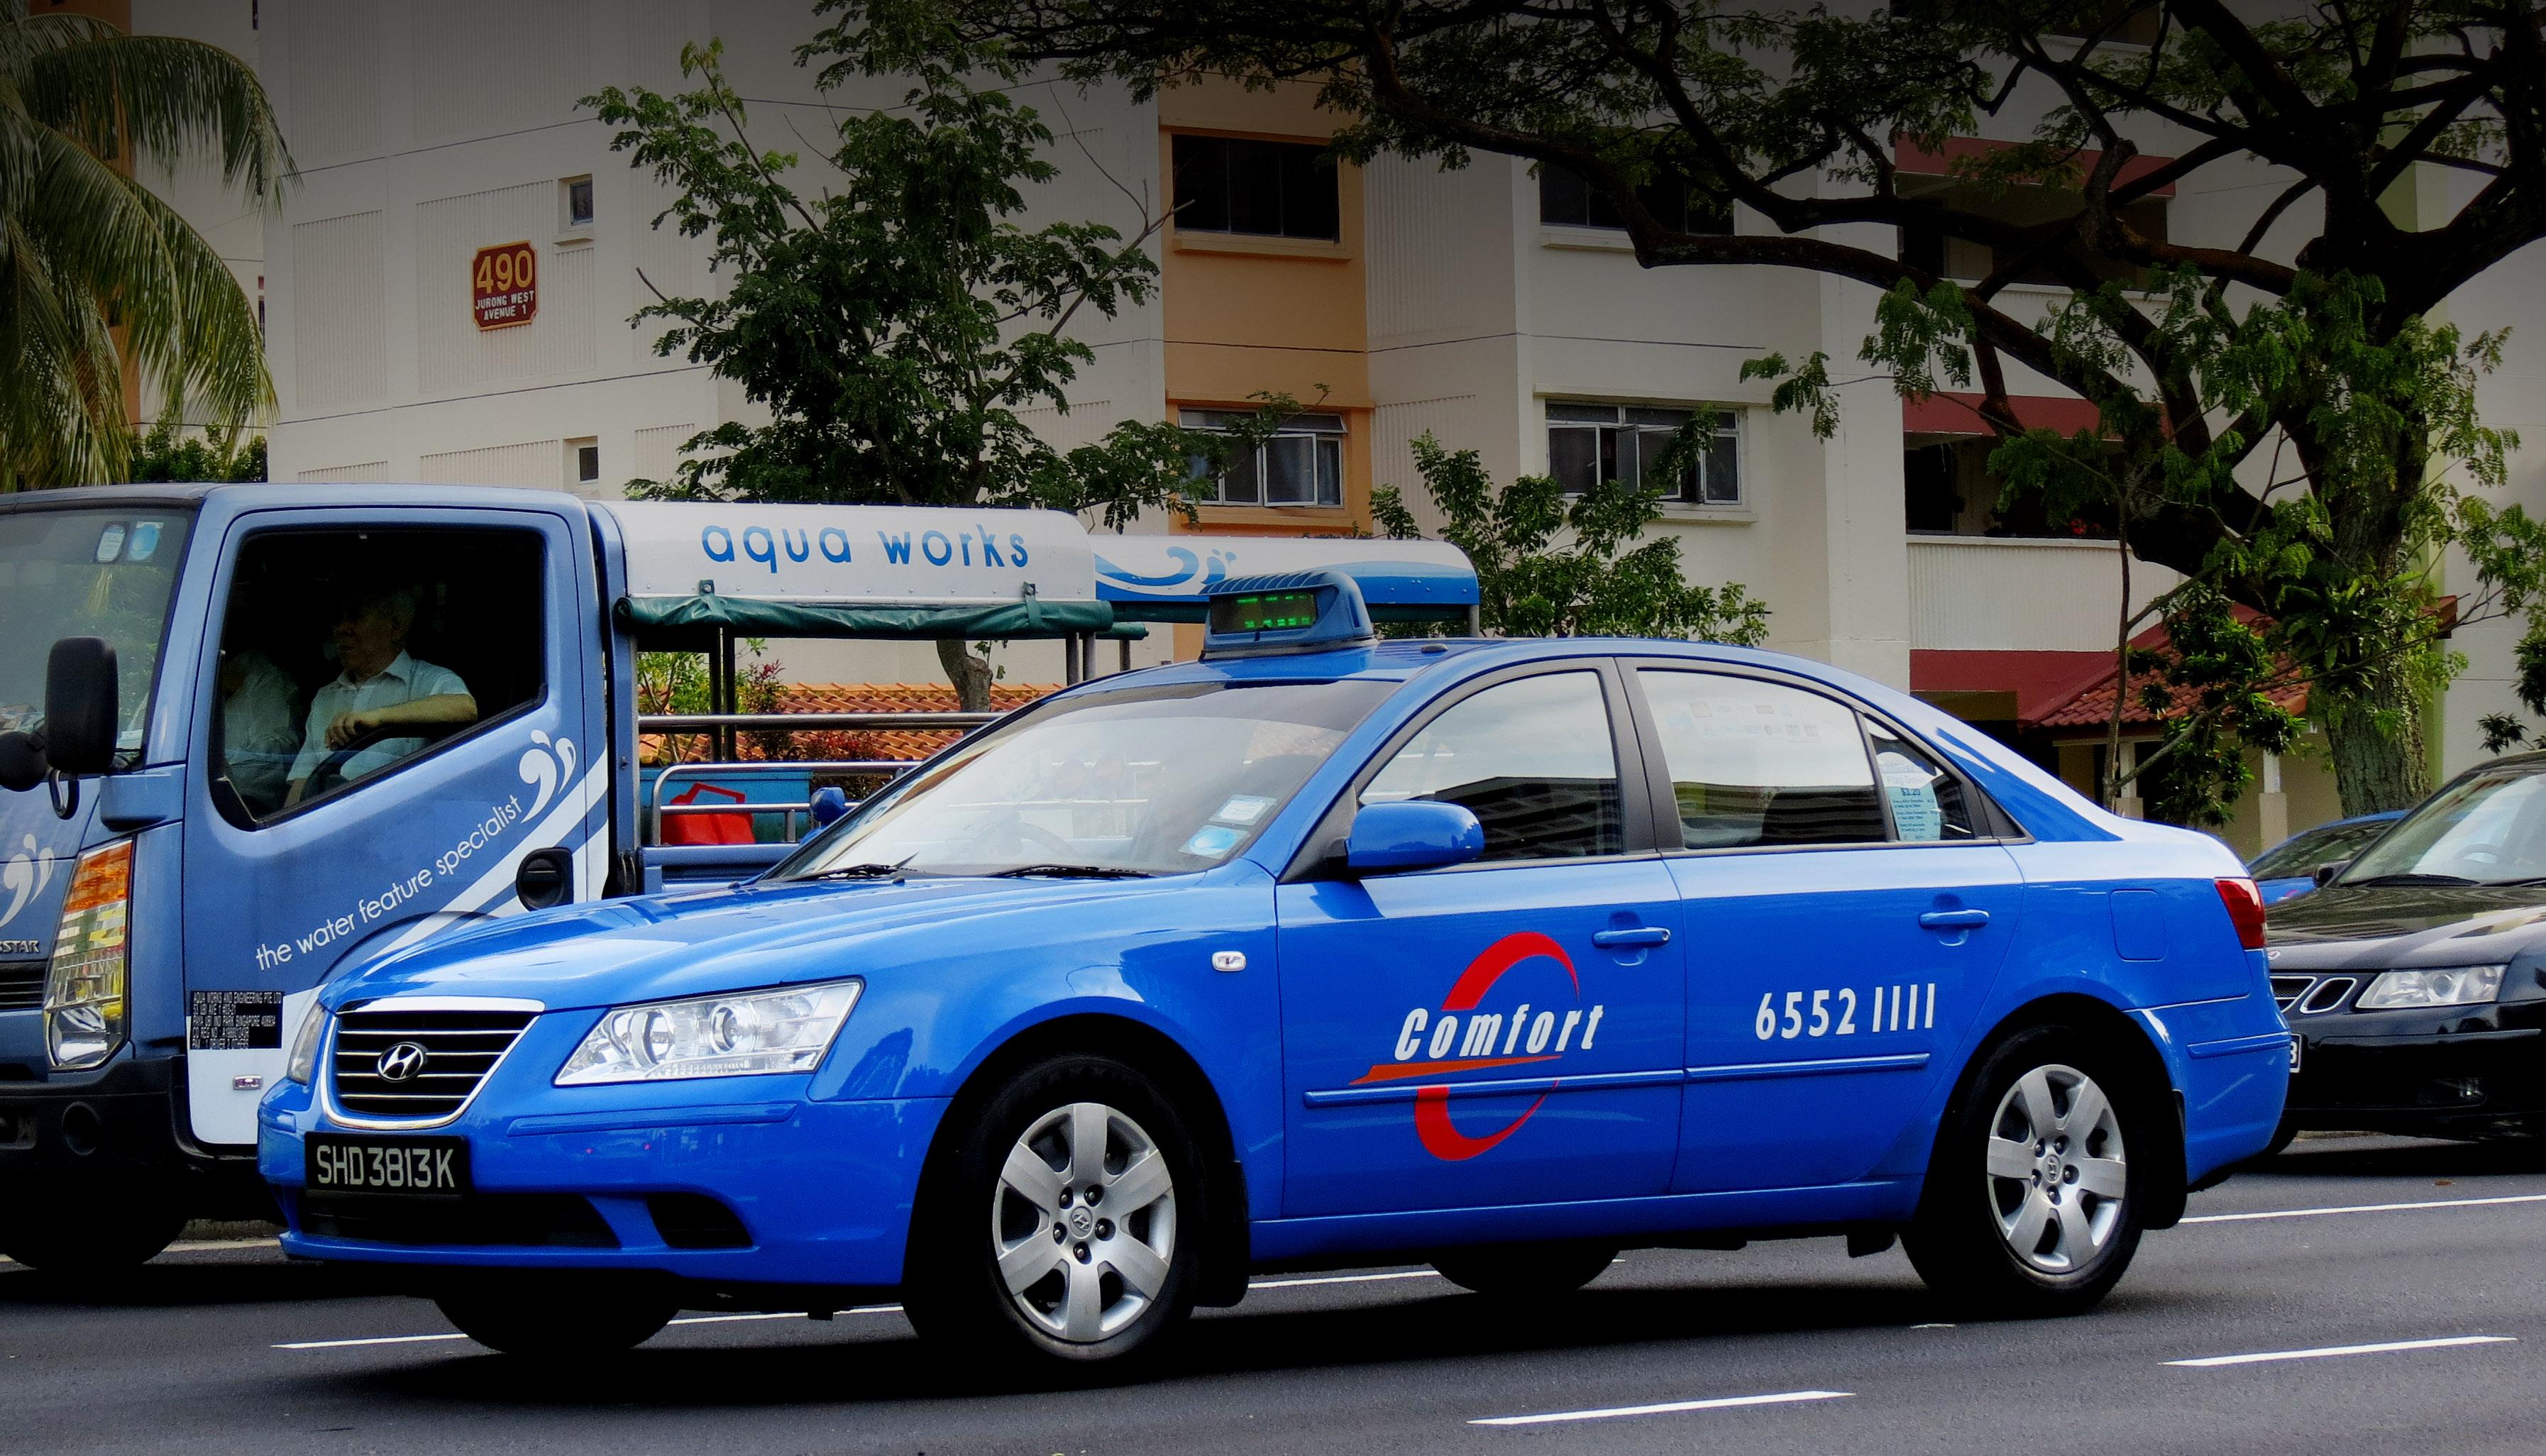 ComfortDelGro taxi. Photo courtesy: Wikimedia